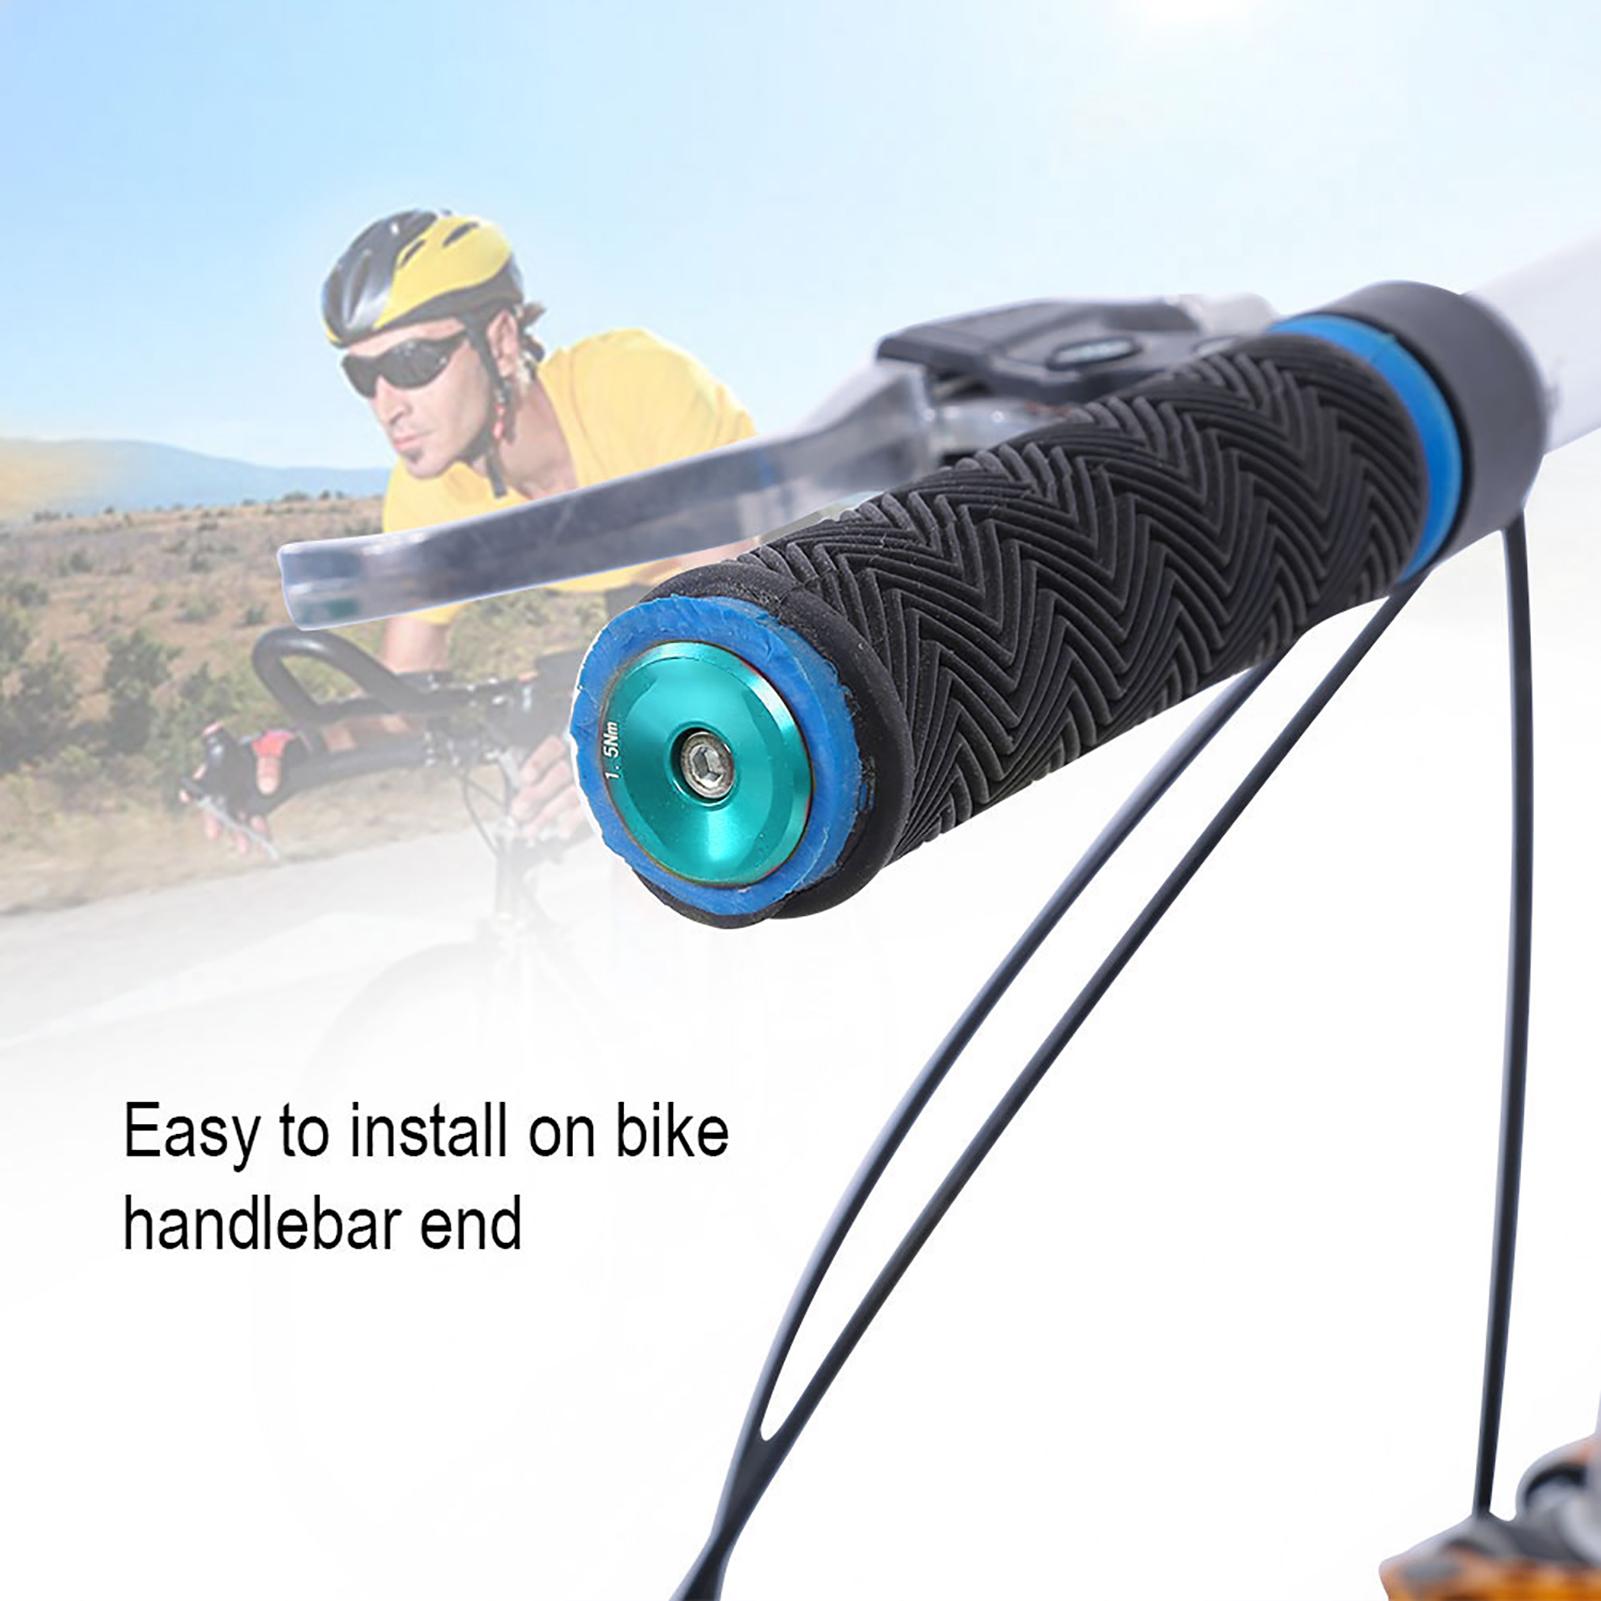 1 Pair Bike Bar End Plugs Bicycle Handlebar End Caps Mountain Road Bike Grips